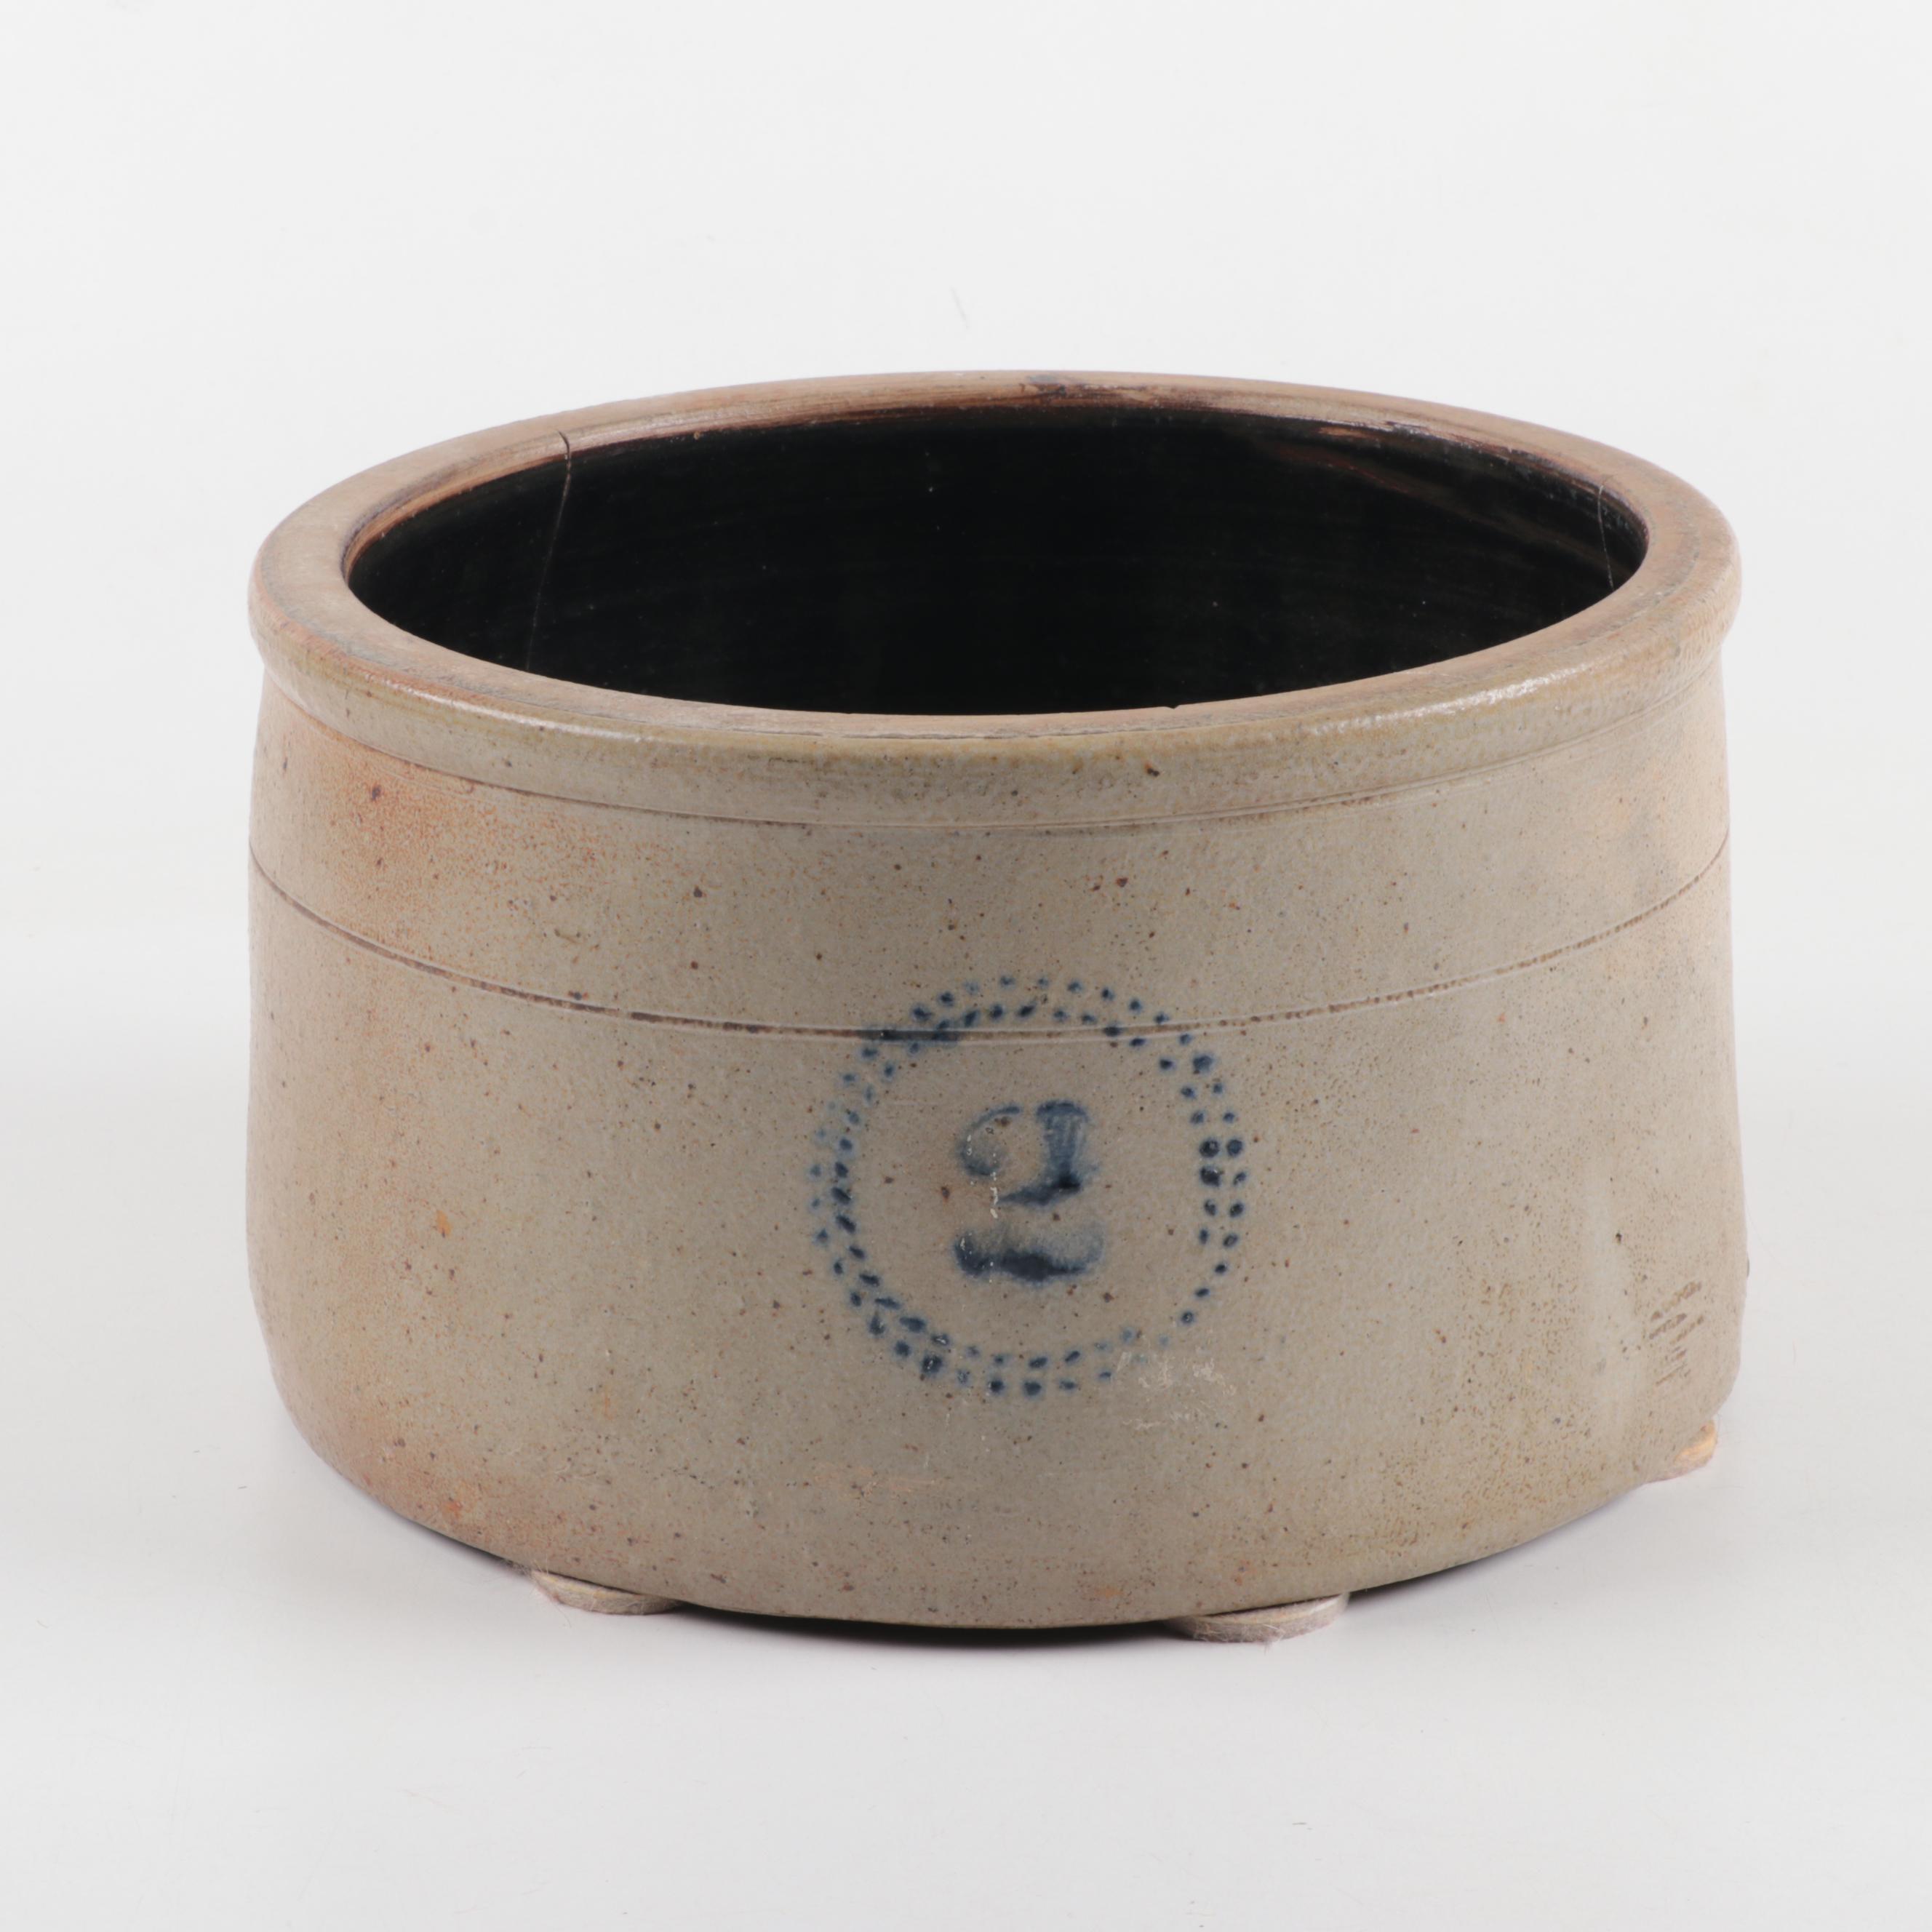 Stoneware Butter Crock